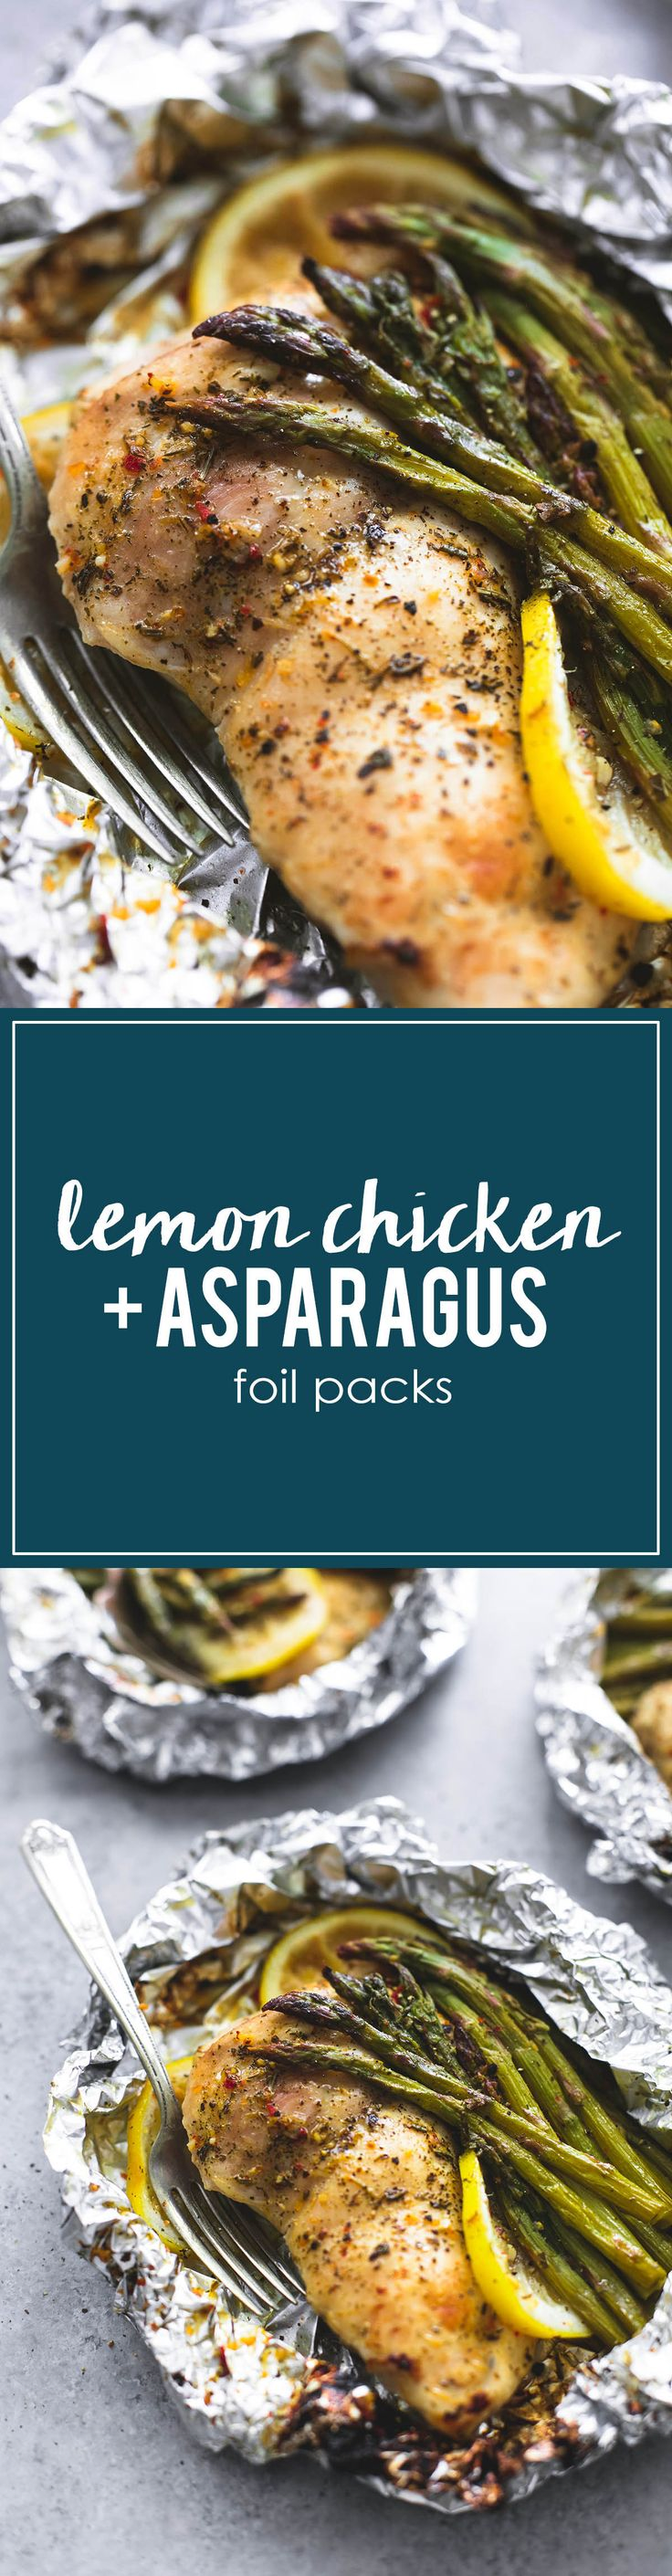 Easy Healthy Lemon Chicken & Asparagus Foil Packs | lecremedelacrumb.com